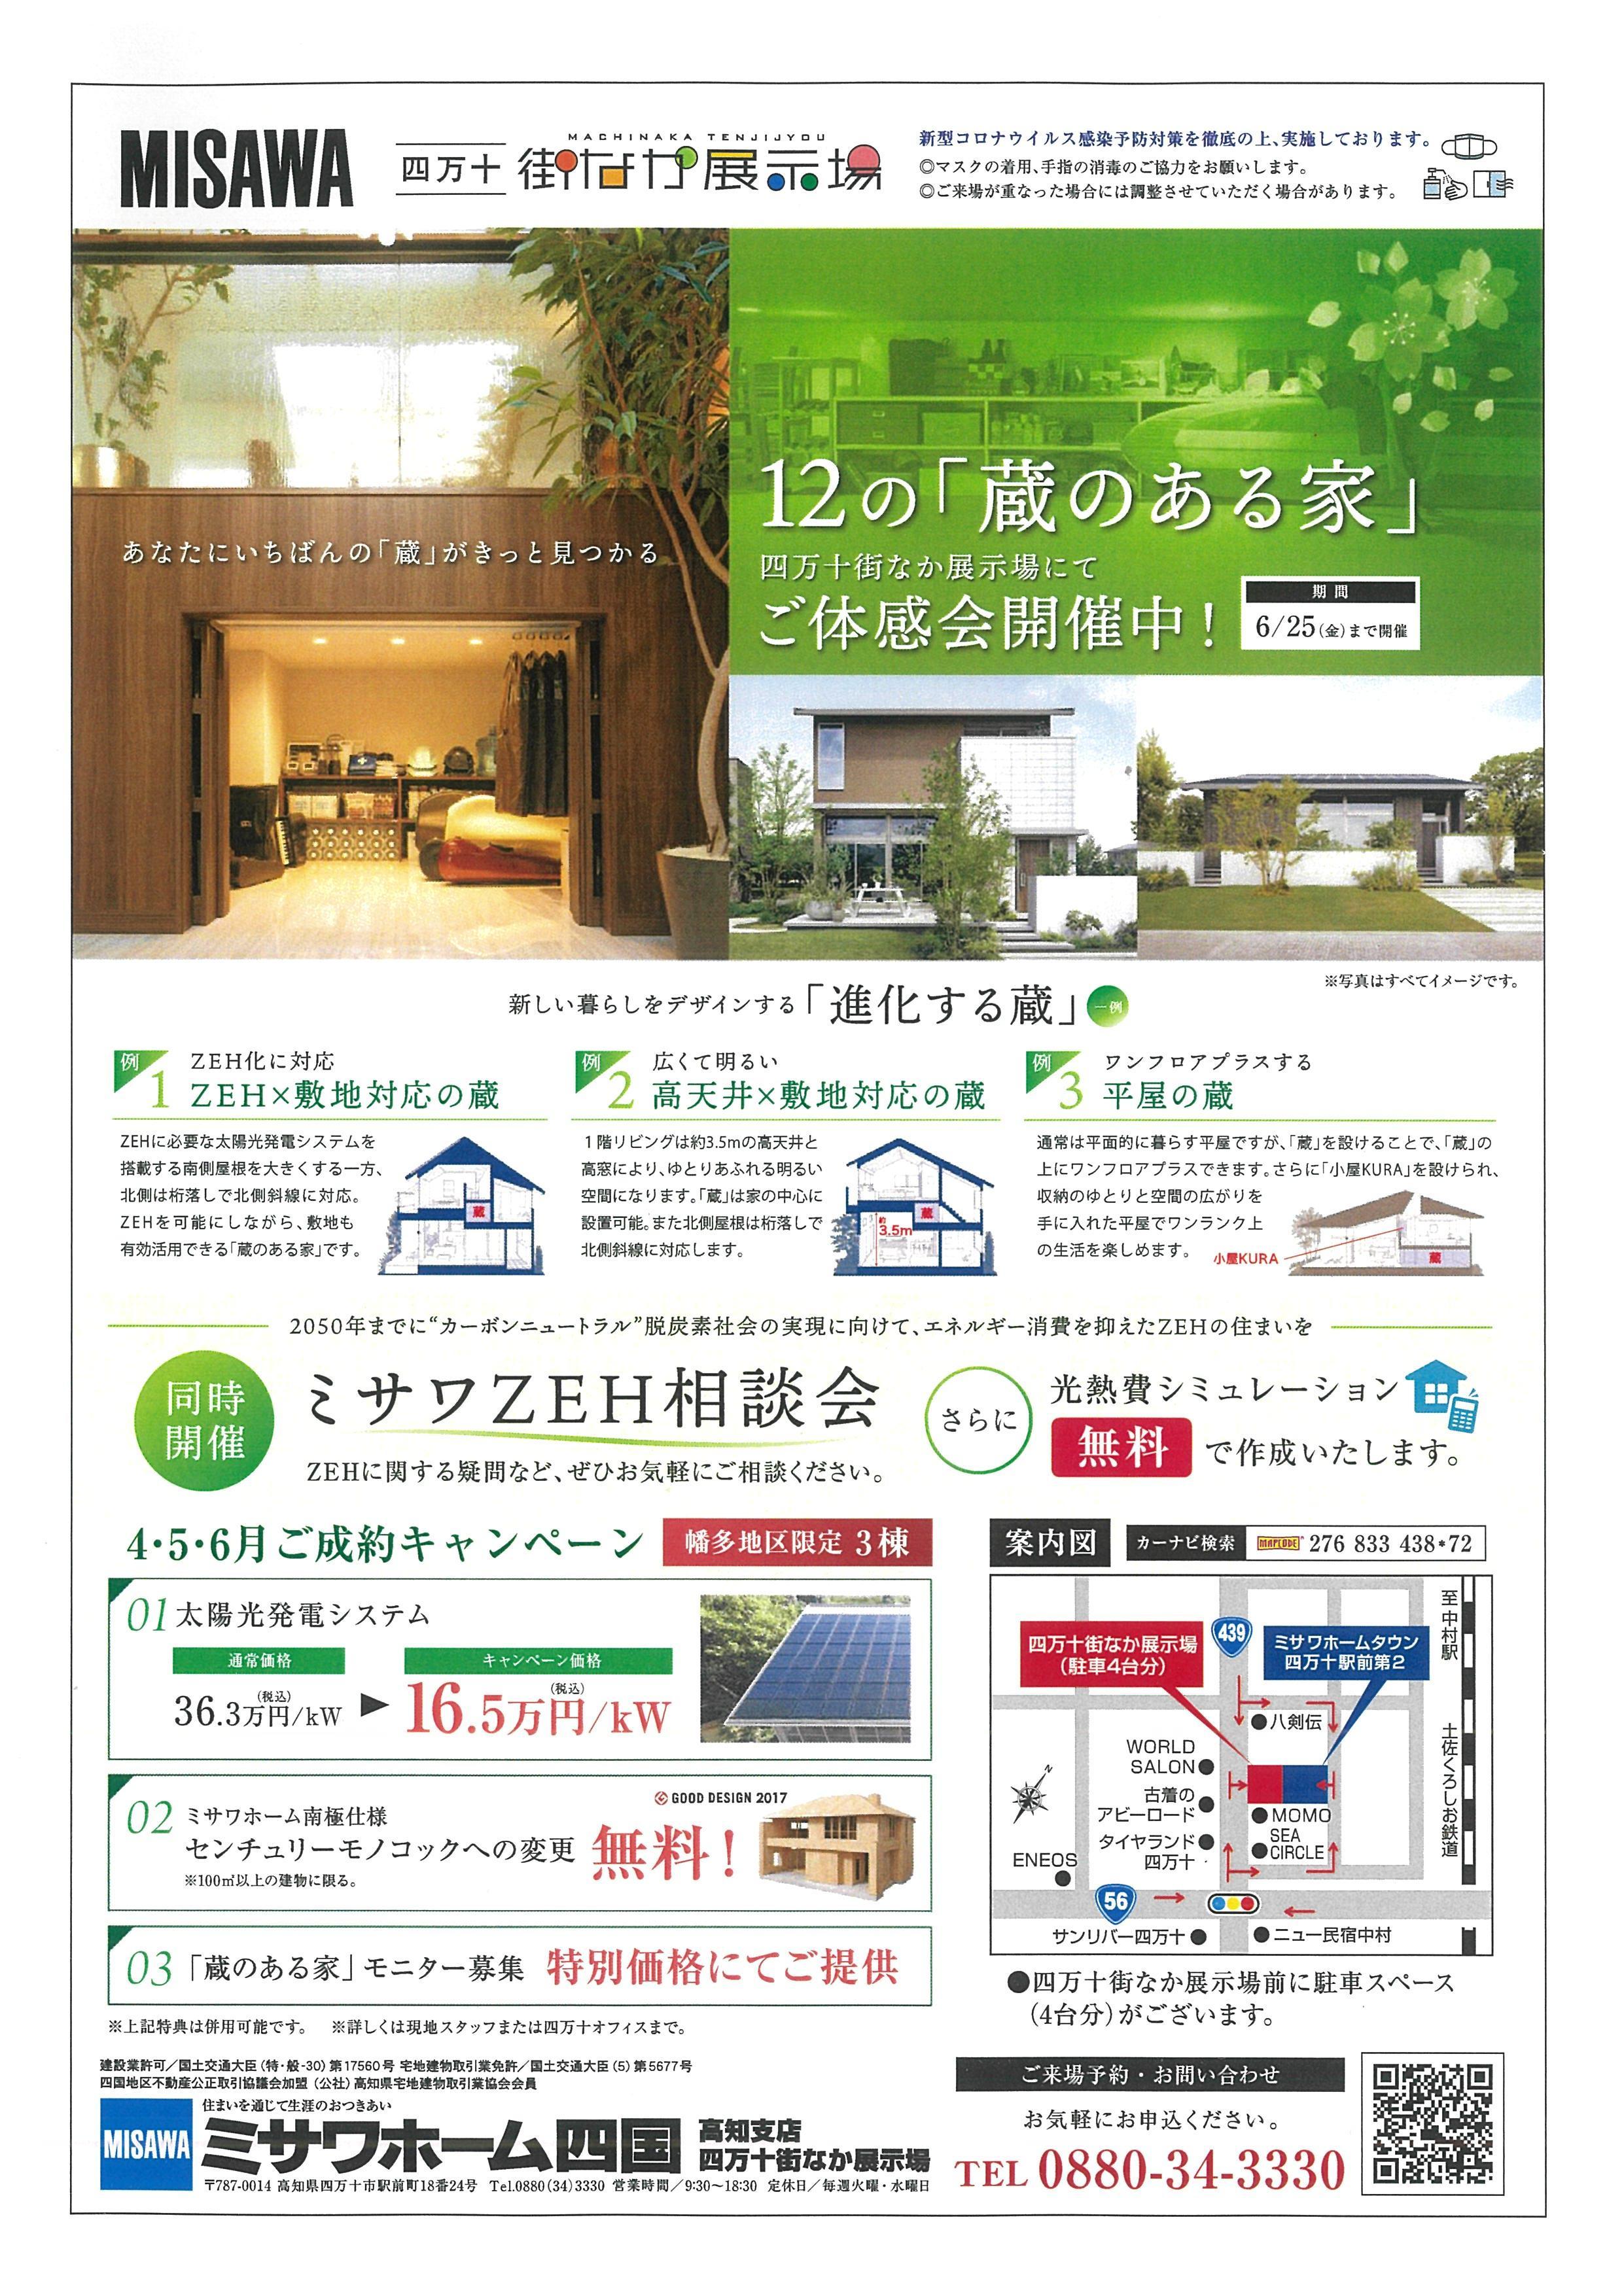 https://shikoku.misawa.co.jp/area_kouchi/20210403161712.jpg